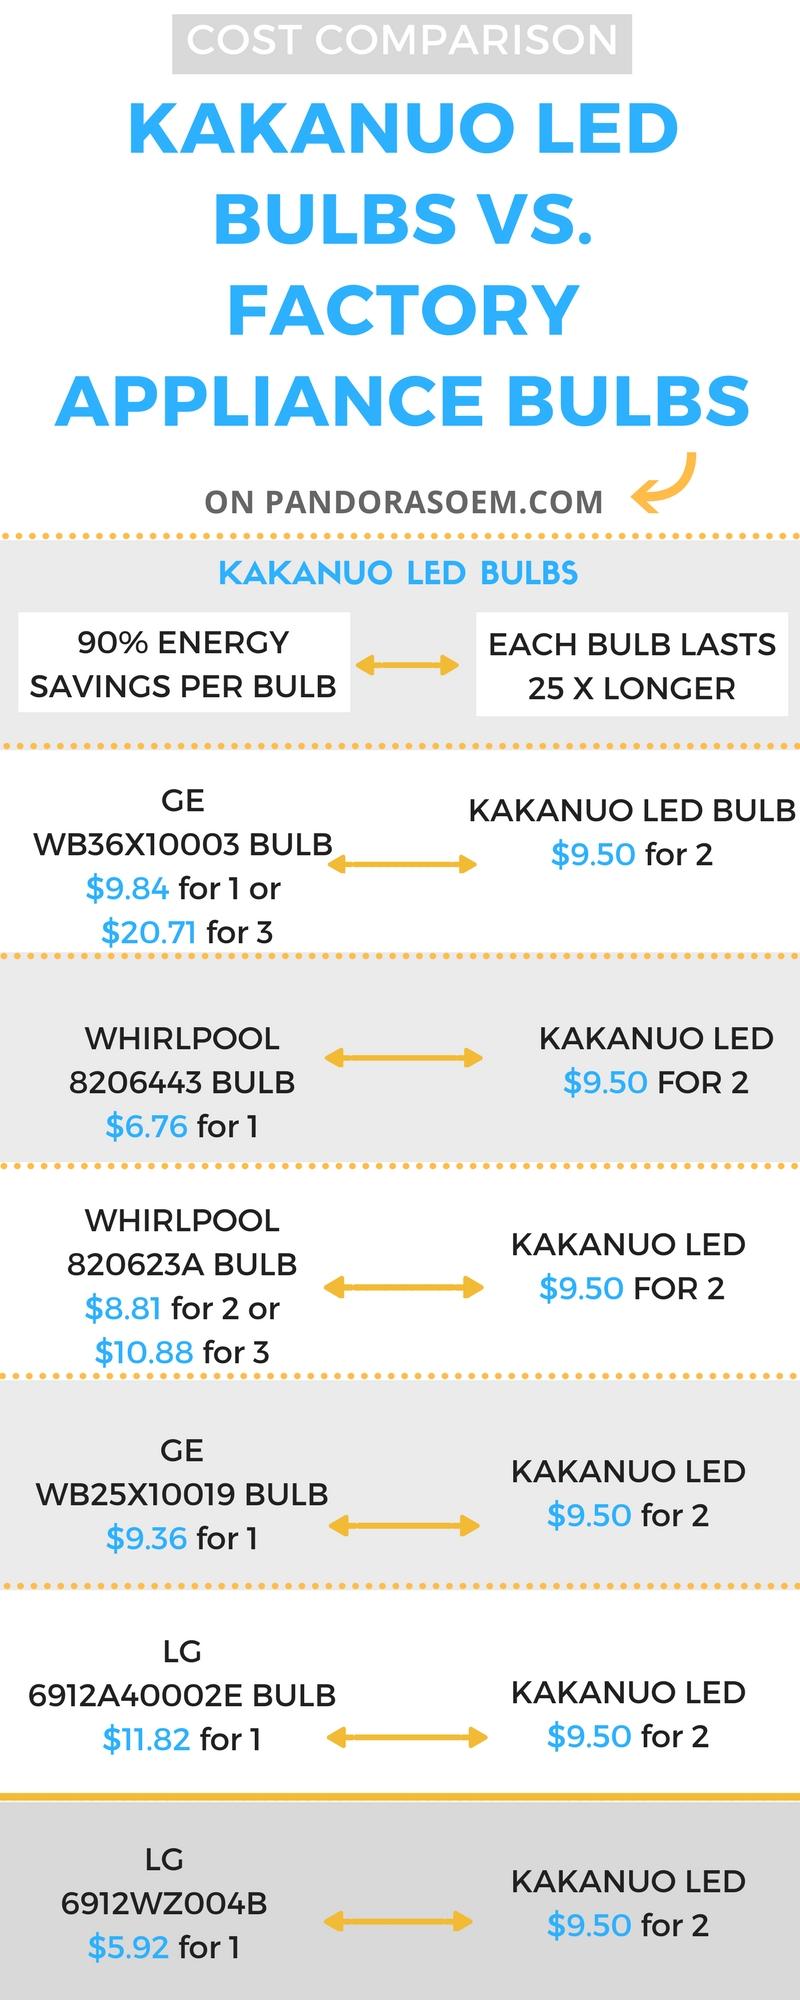 Price comparison of LED bulbs vs. Factory appliance bulbs | LED bulbs are often CHEAPER!